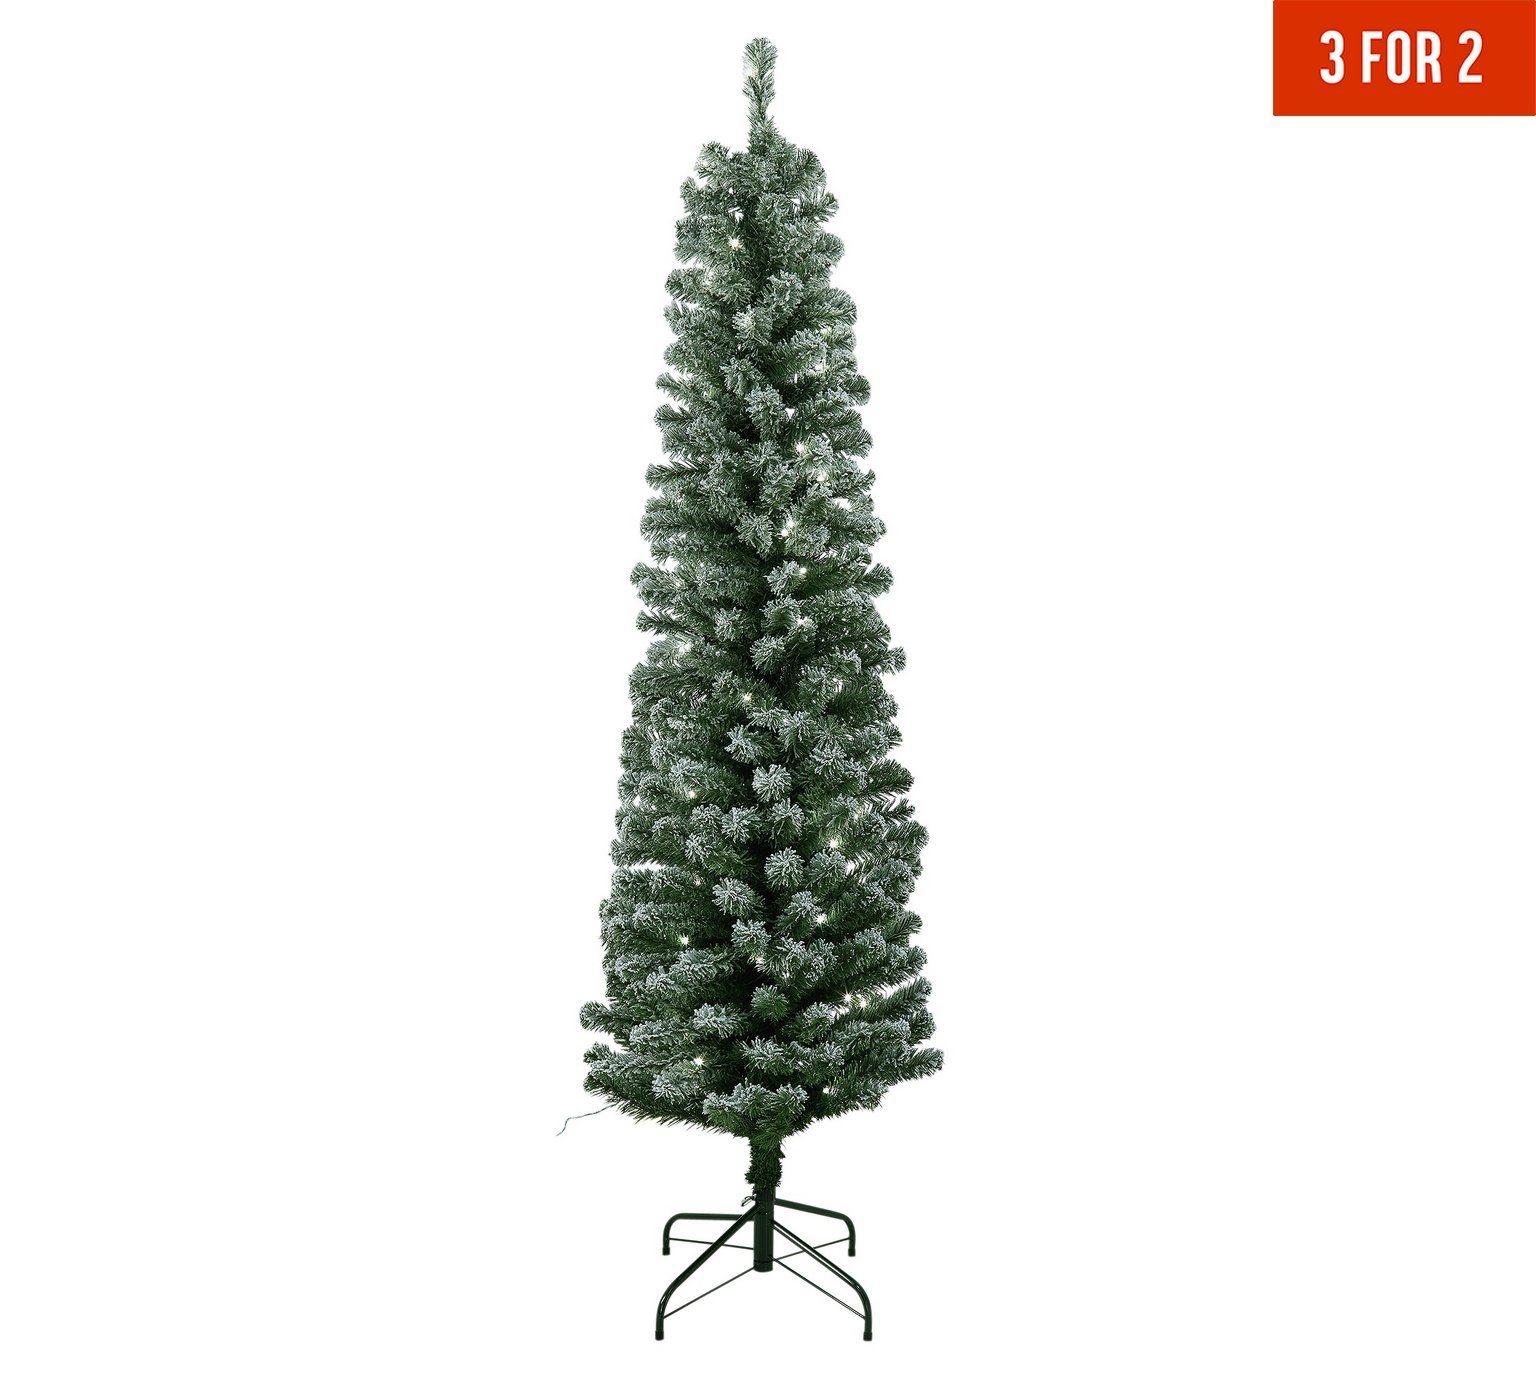 kmart christmas tree sale - econhomes.com